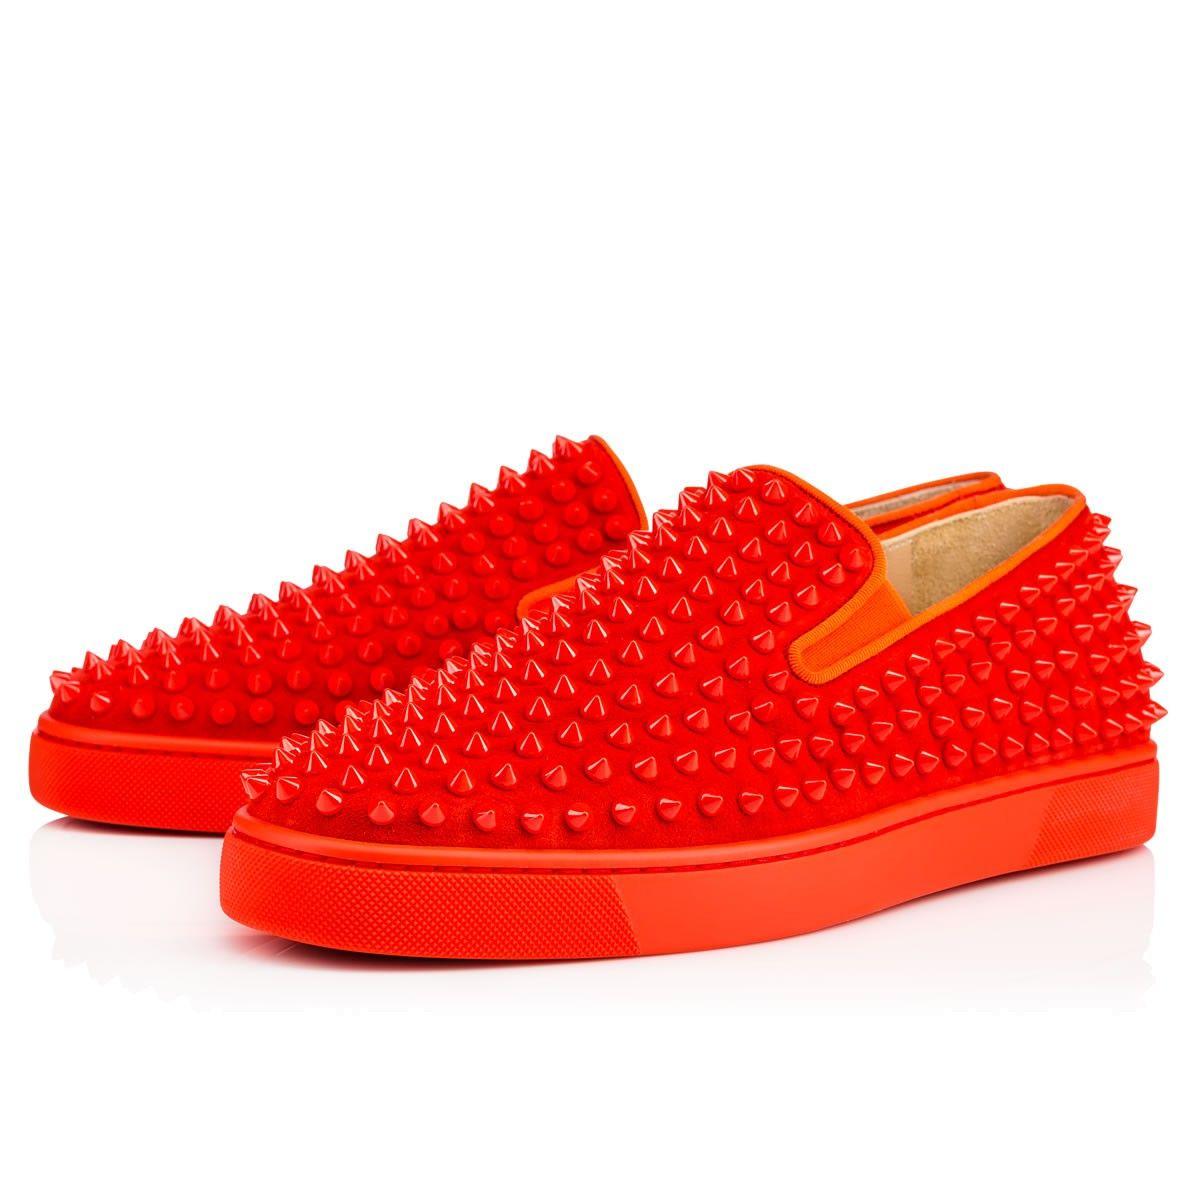 Roller tennis shoes - Shoes Roller Boat Men S Flat Christian Louboutin